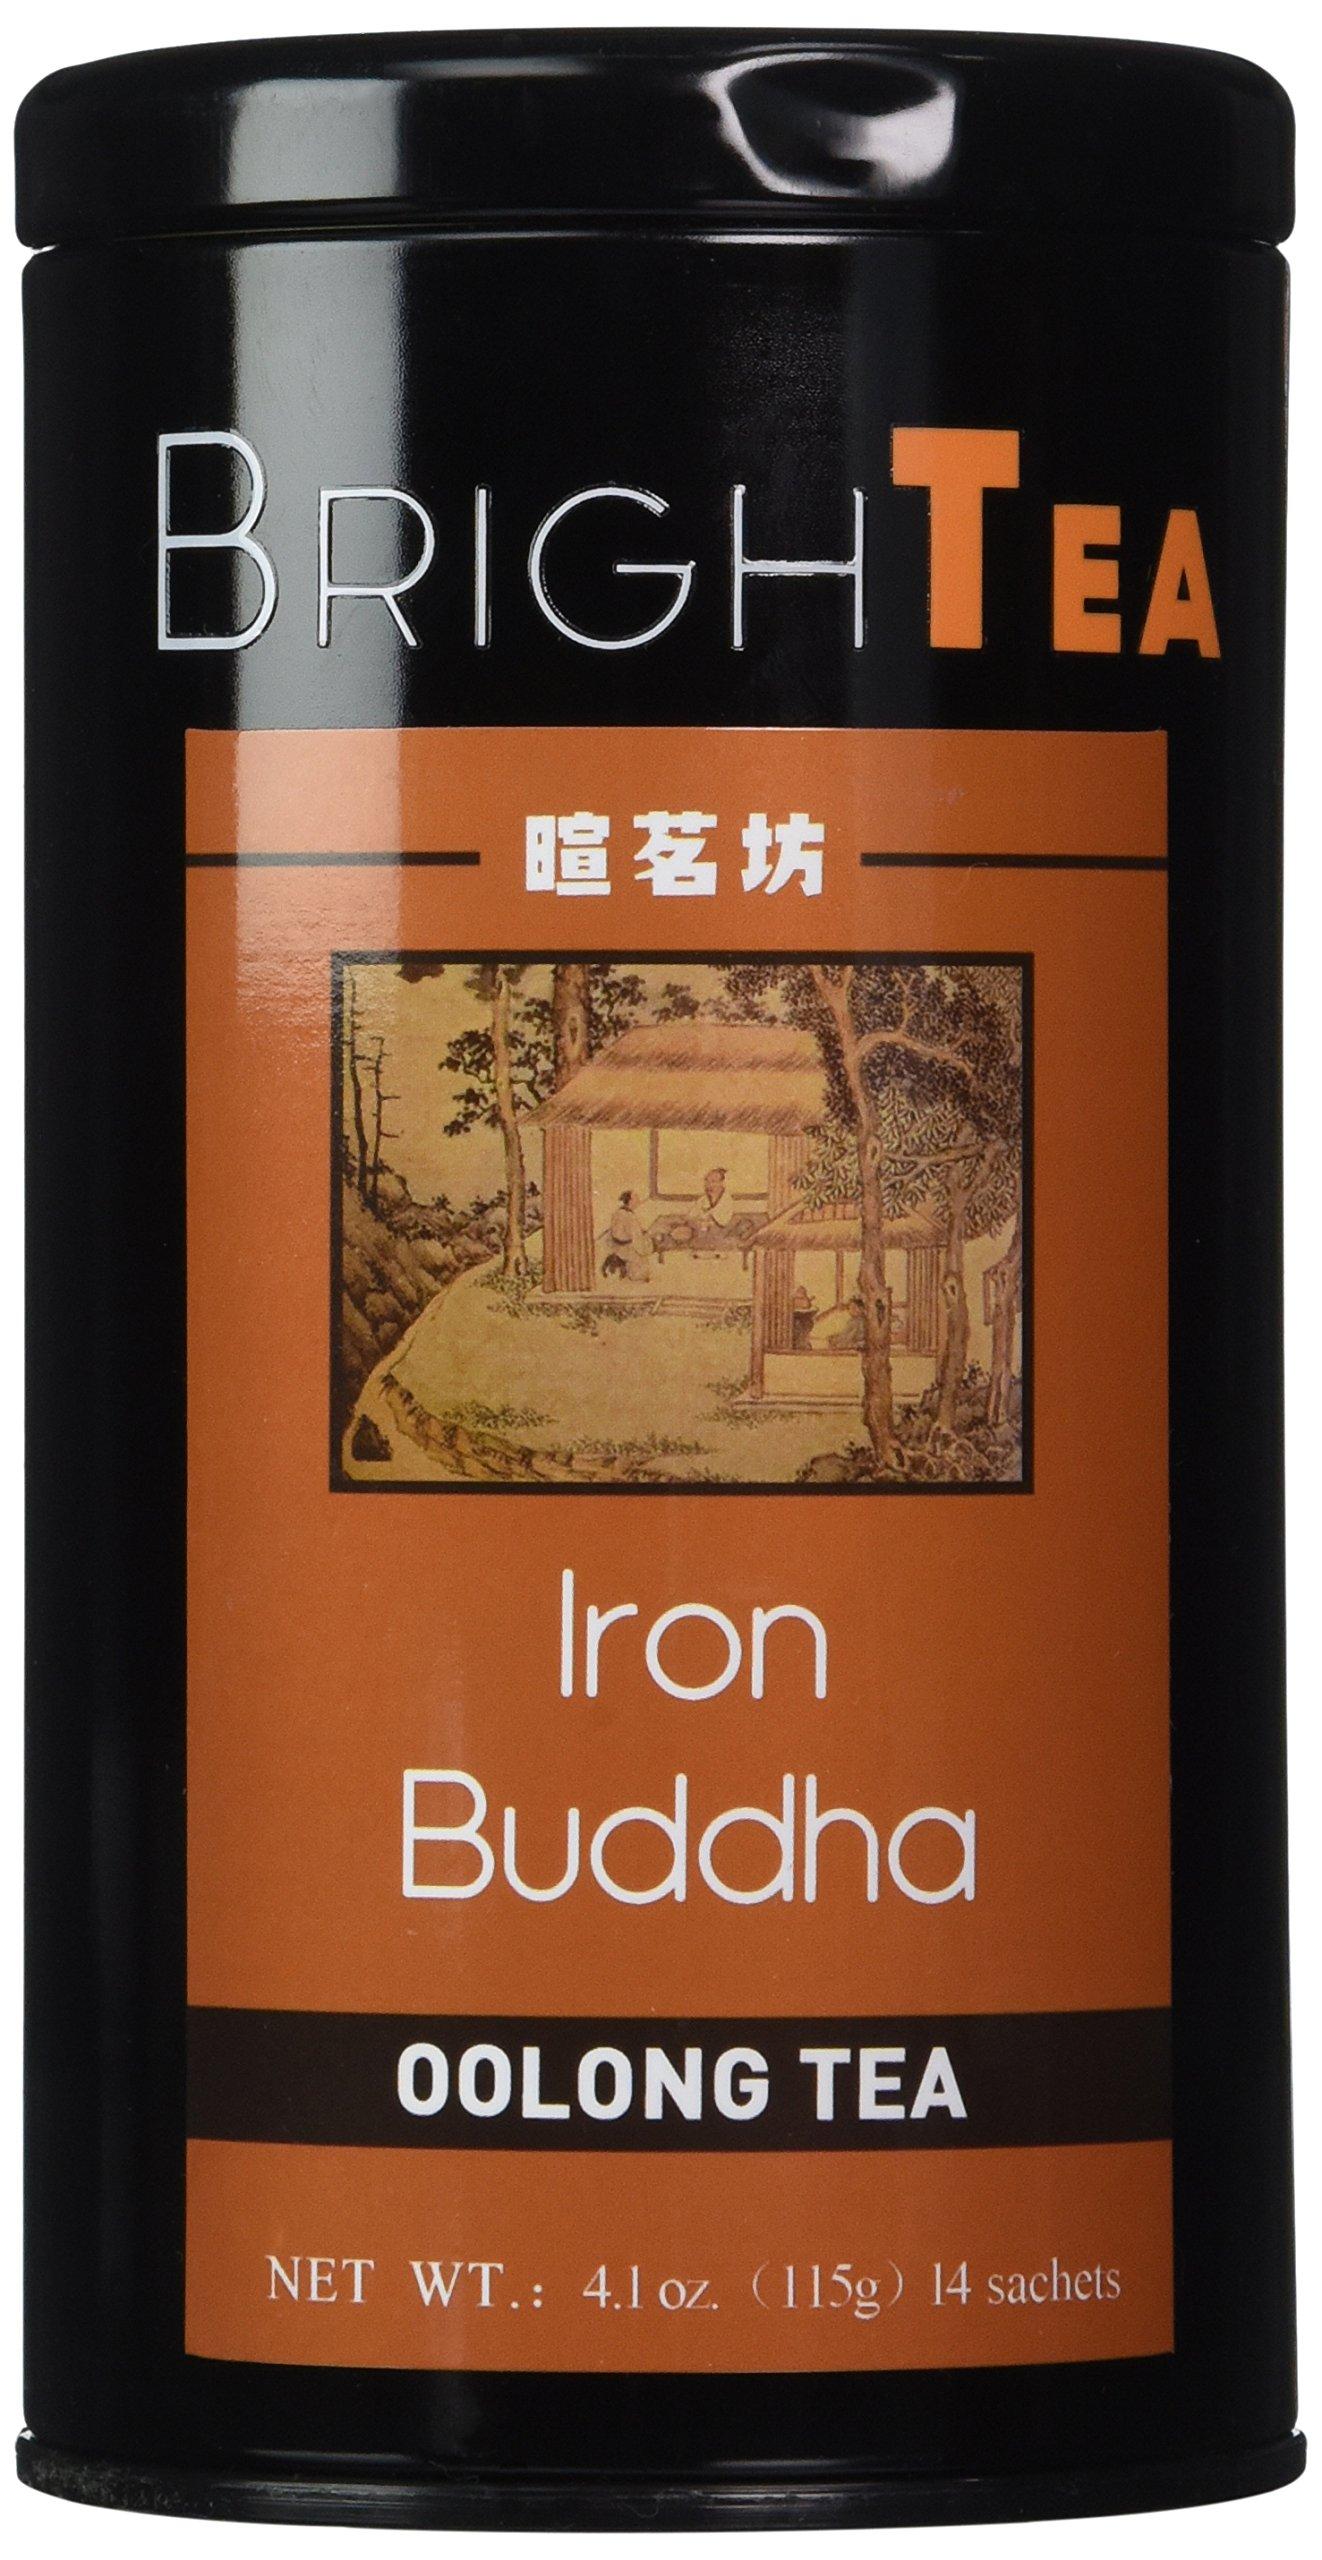 Brightea Monkey Picked Oolong Tea Loose Leaf China Tie Guan Yin Iron Mercy Goddess 4.1 Ounce Tin (Supreme Grade) by Brightea